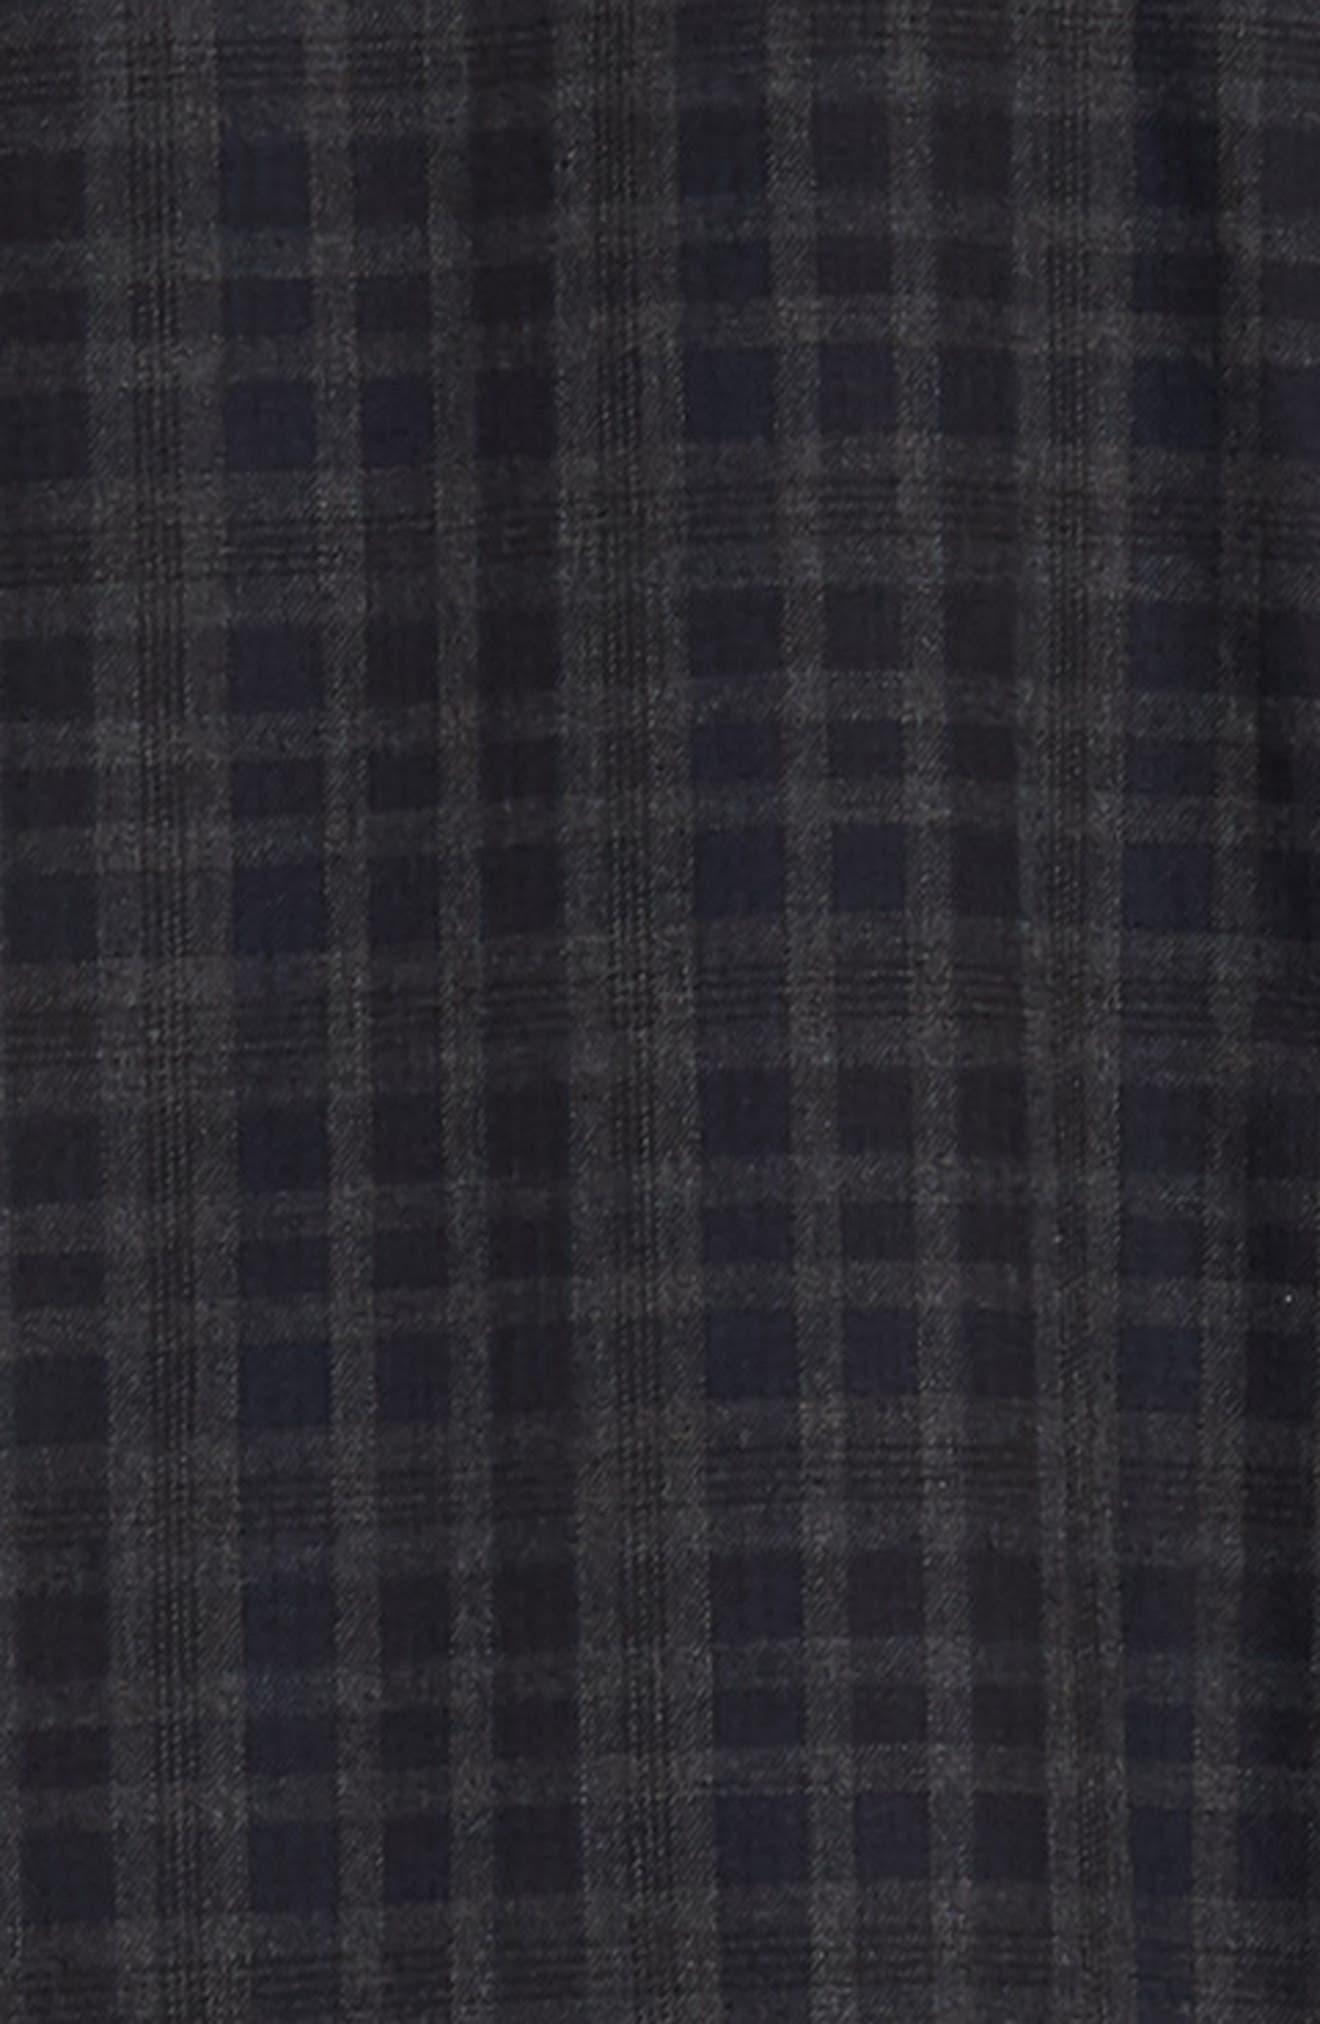 Slim Fit Check Flannel Sport Shirt,                             Alternate thumbnail 6, color,                             BLACK HEATHER NAVY CHECK